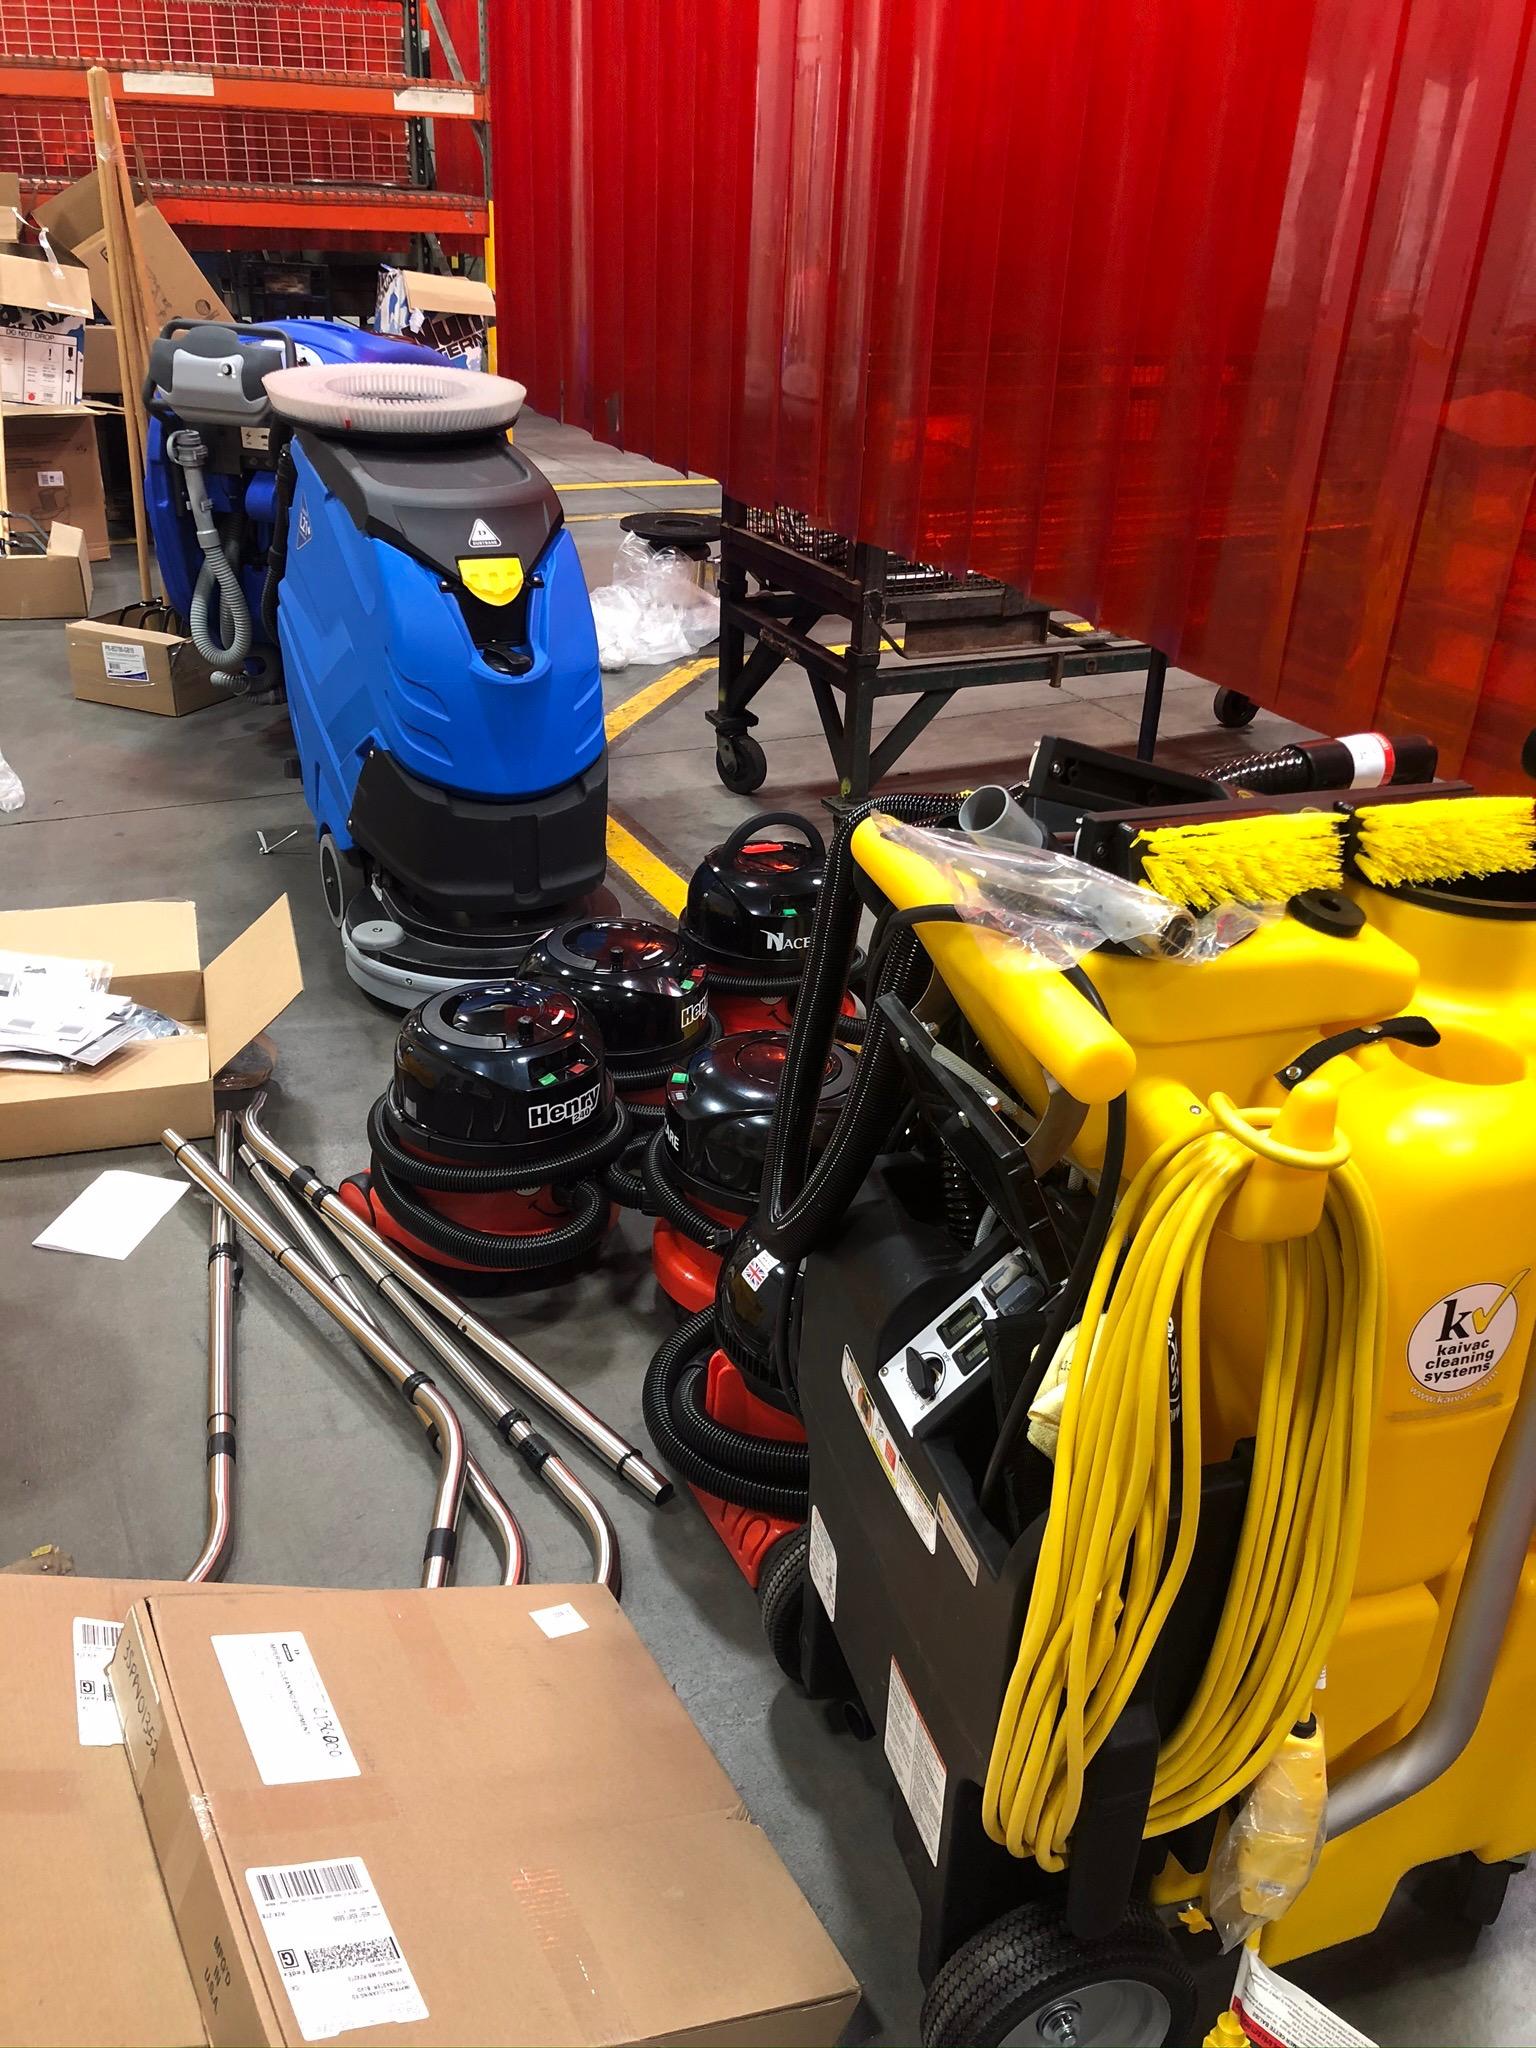 Supplies at the Polaris Facility